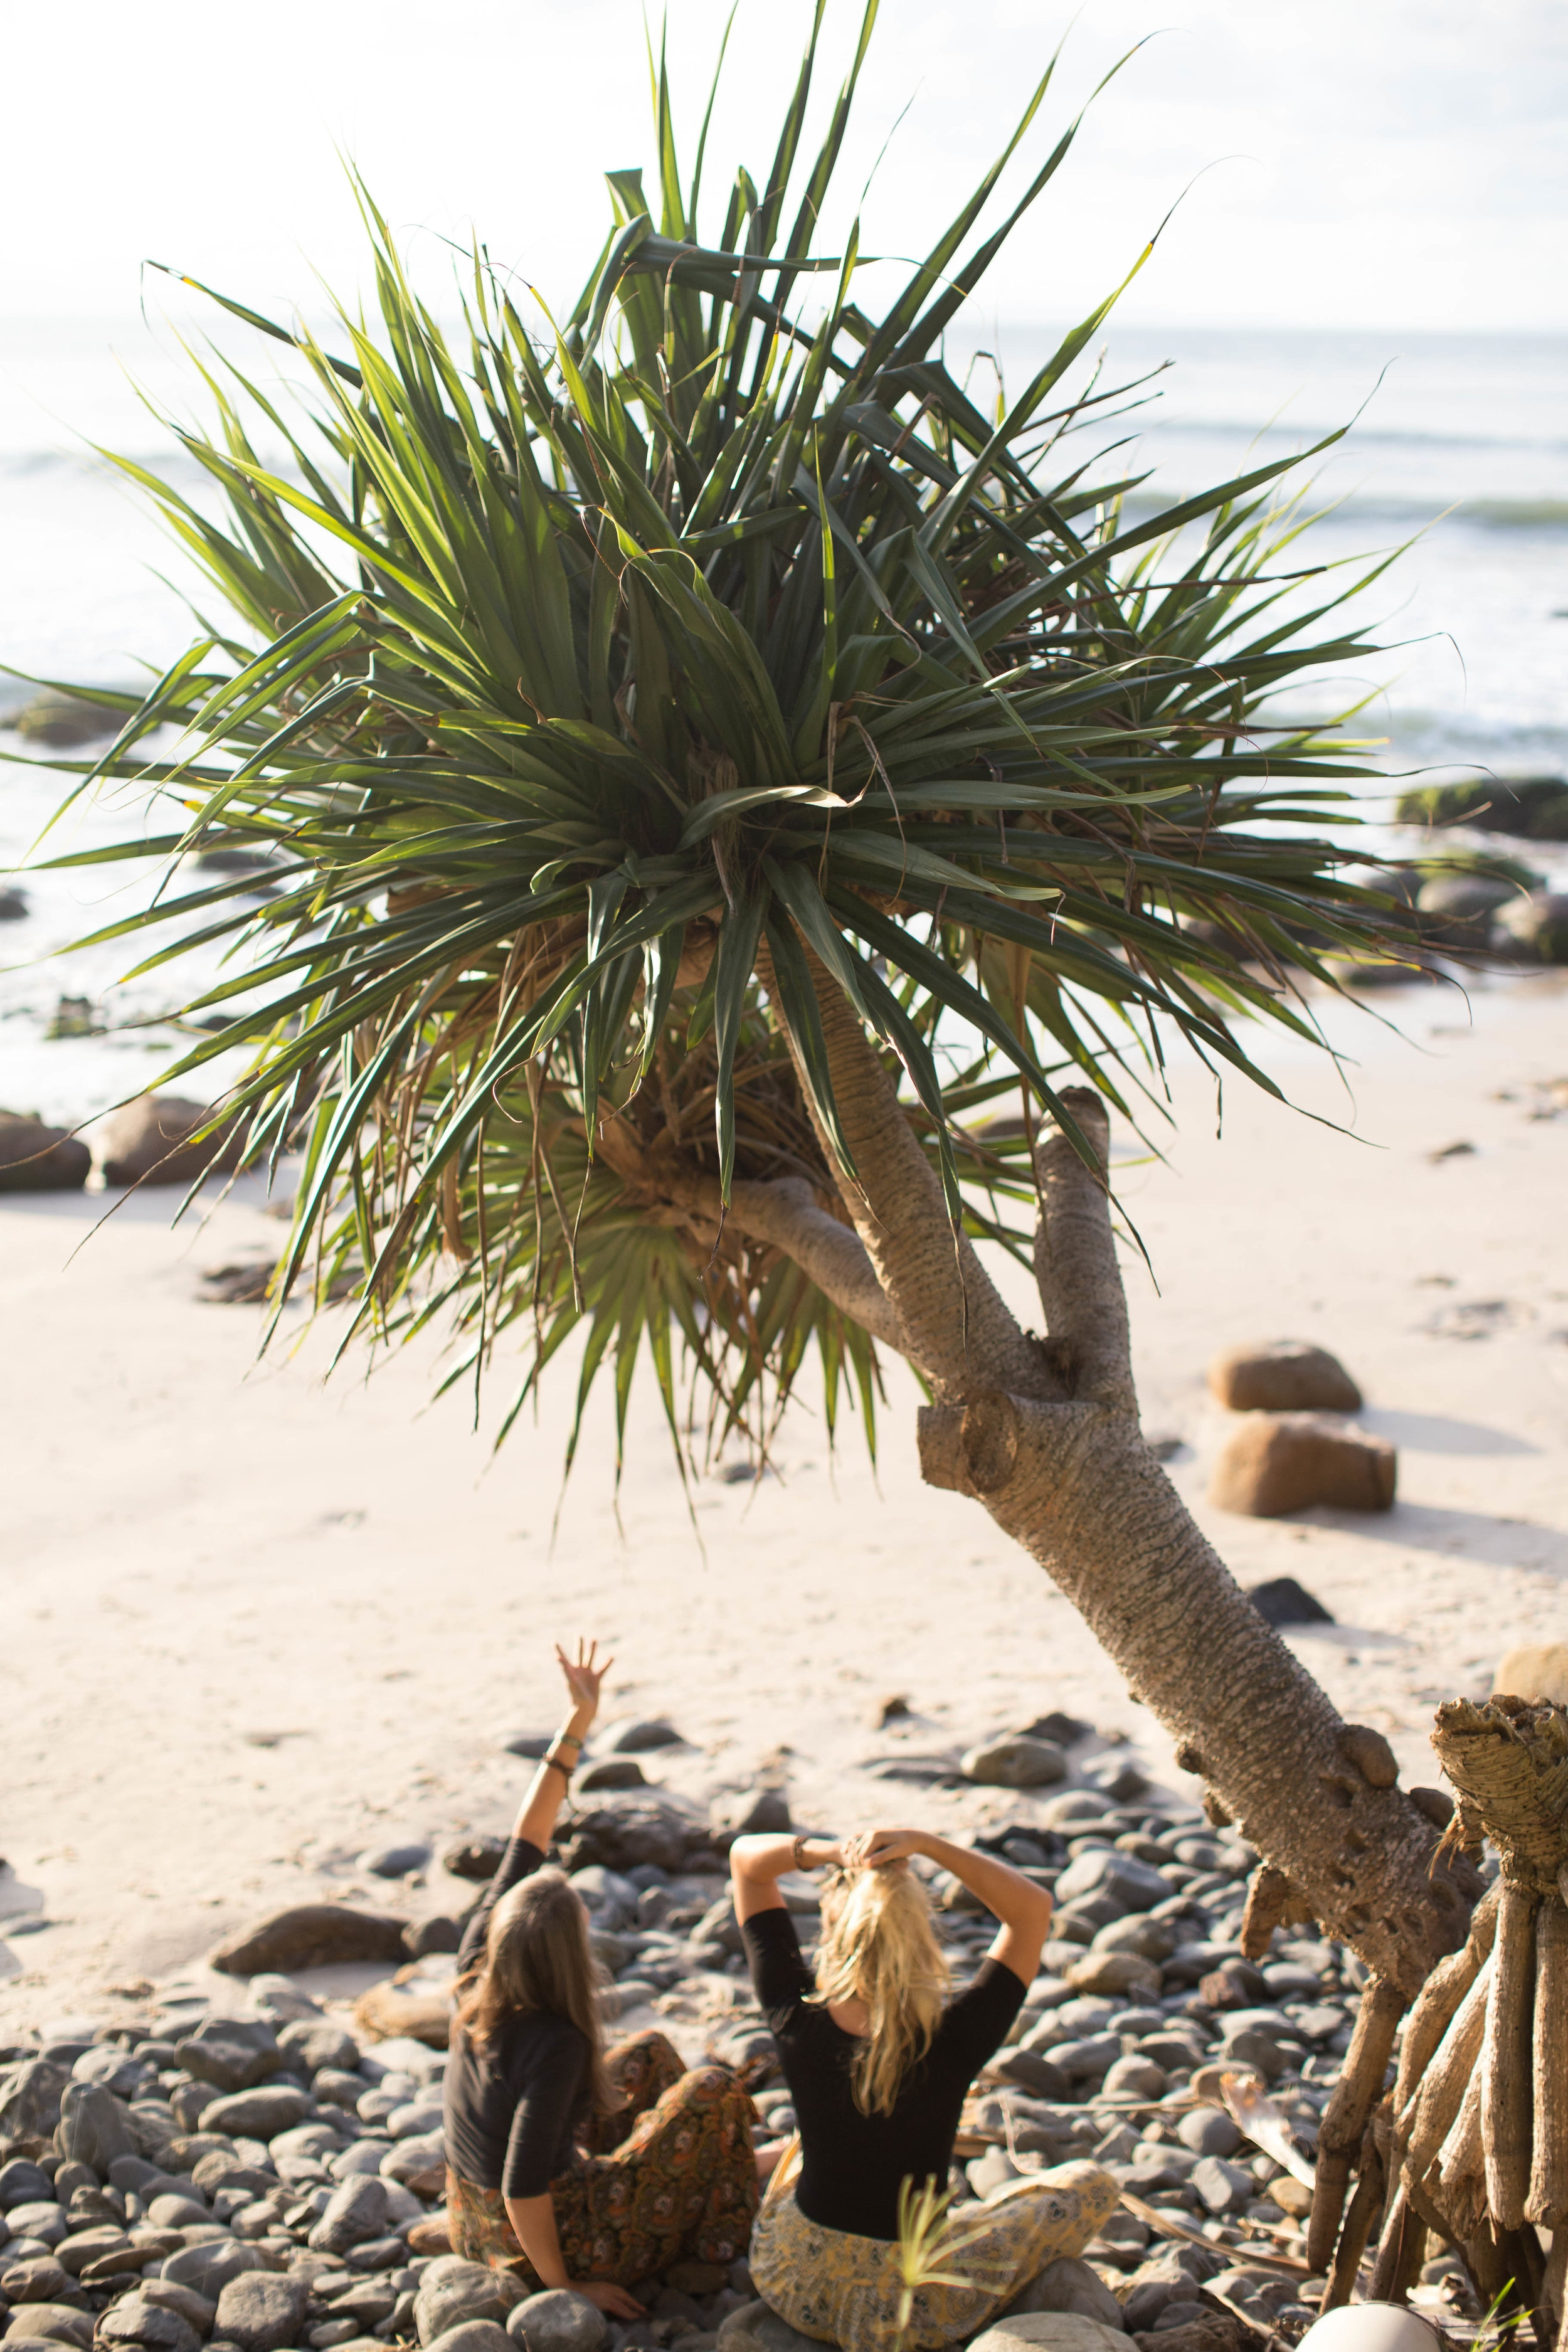 NatureConnectionByronBayMadisonReames.jpg